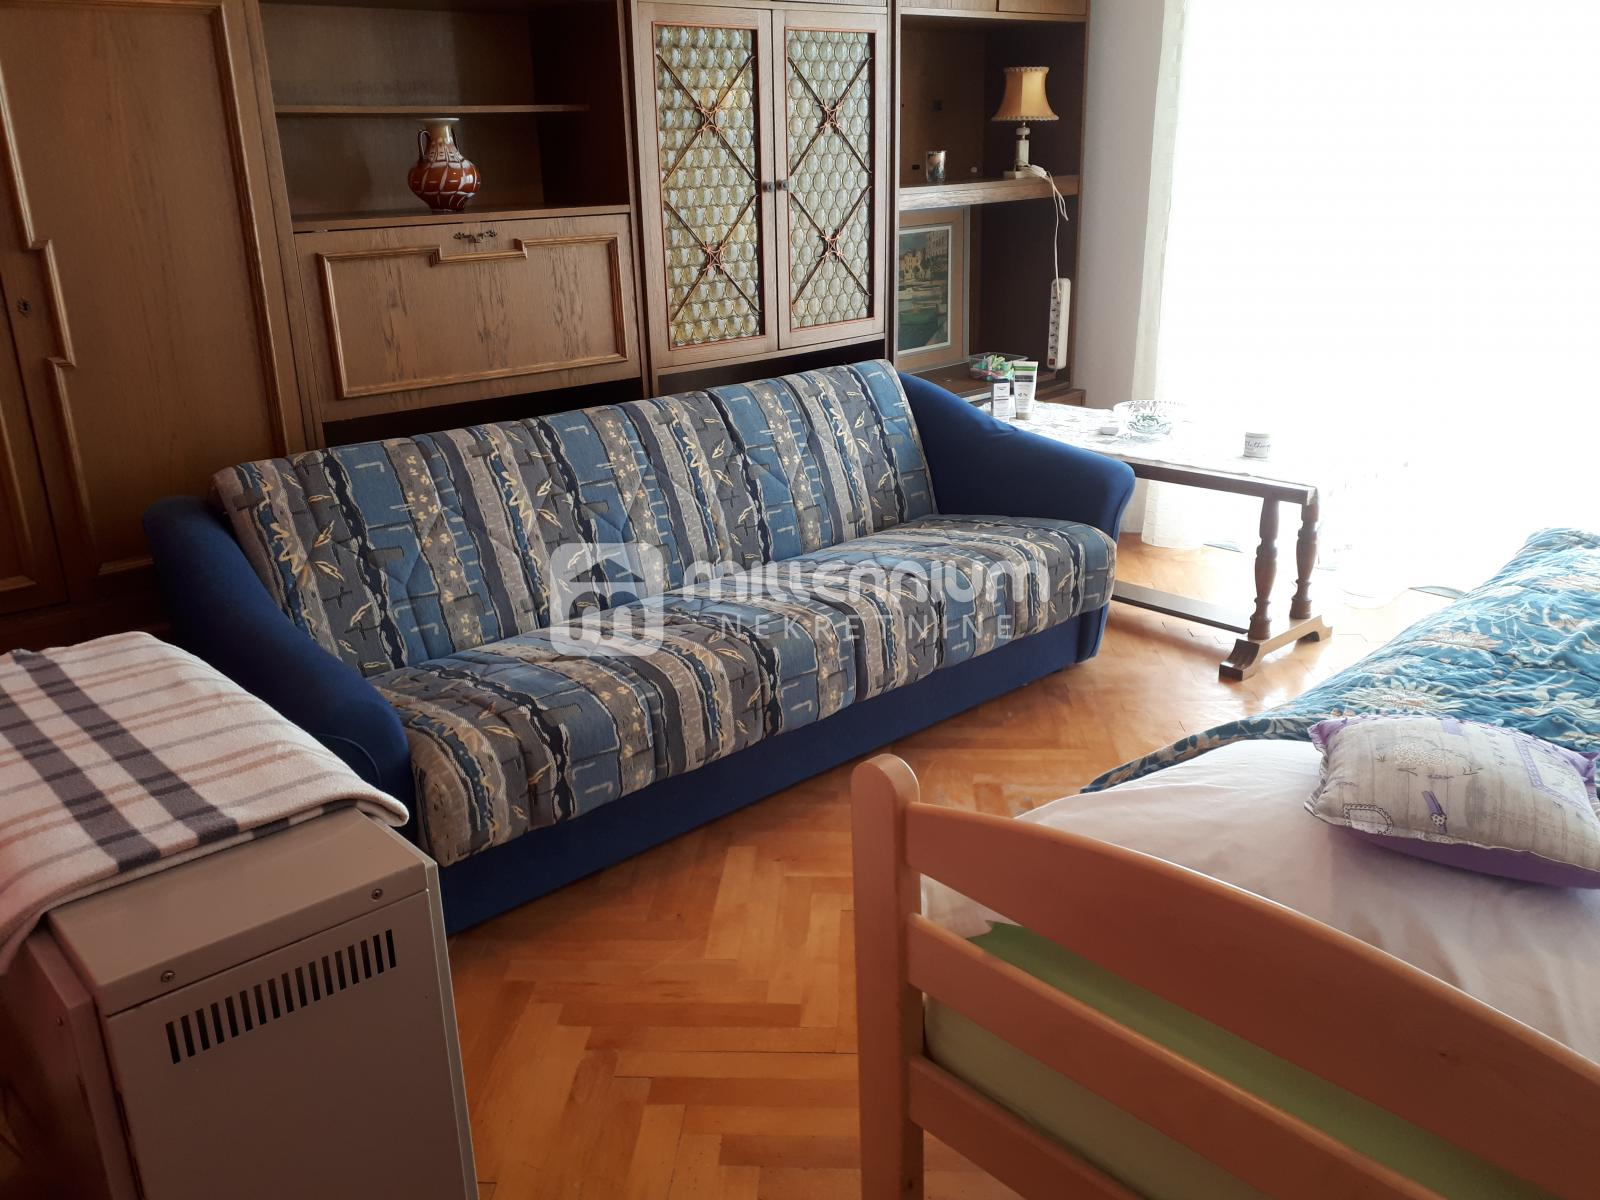 Rijeka, Donja Vežica, 62.27m2, 3-sobni stan, lođa